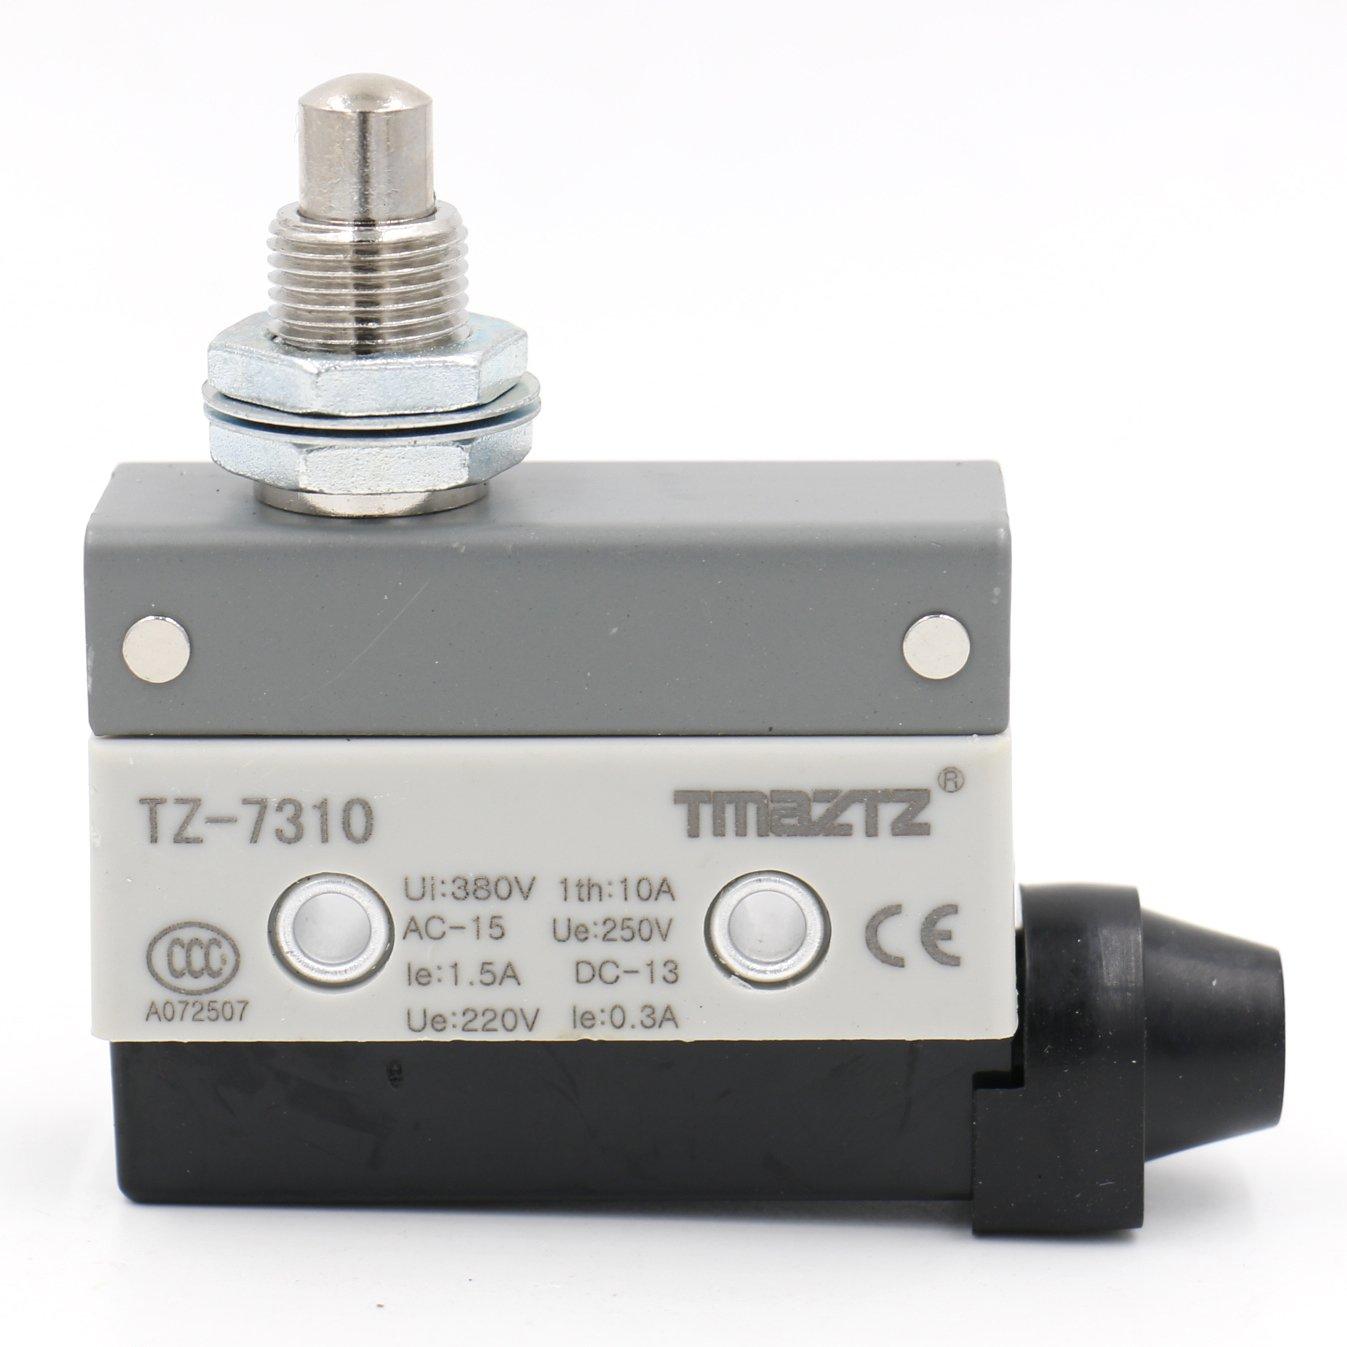 Heschen Horizontal limit switch TZ-7311 momentray parallel roller plunger AC 10A